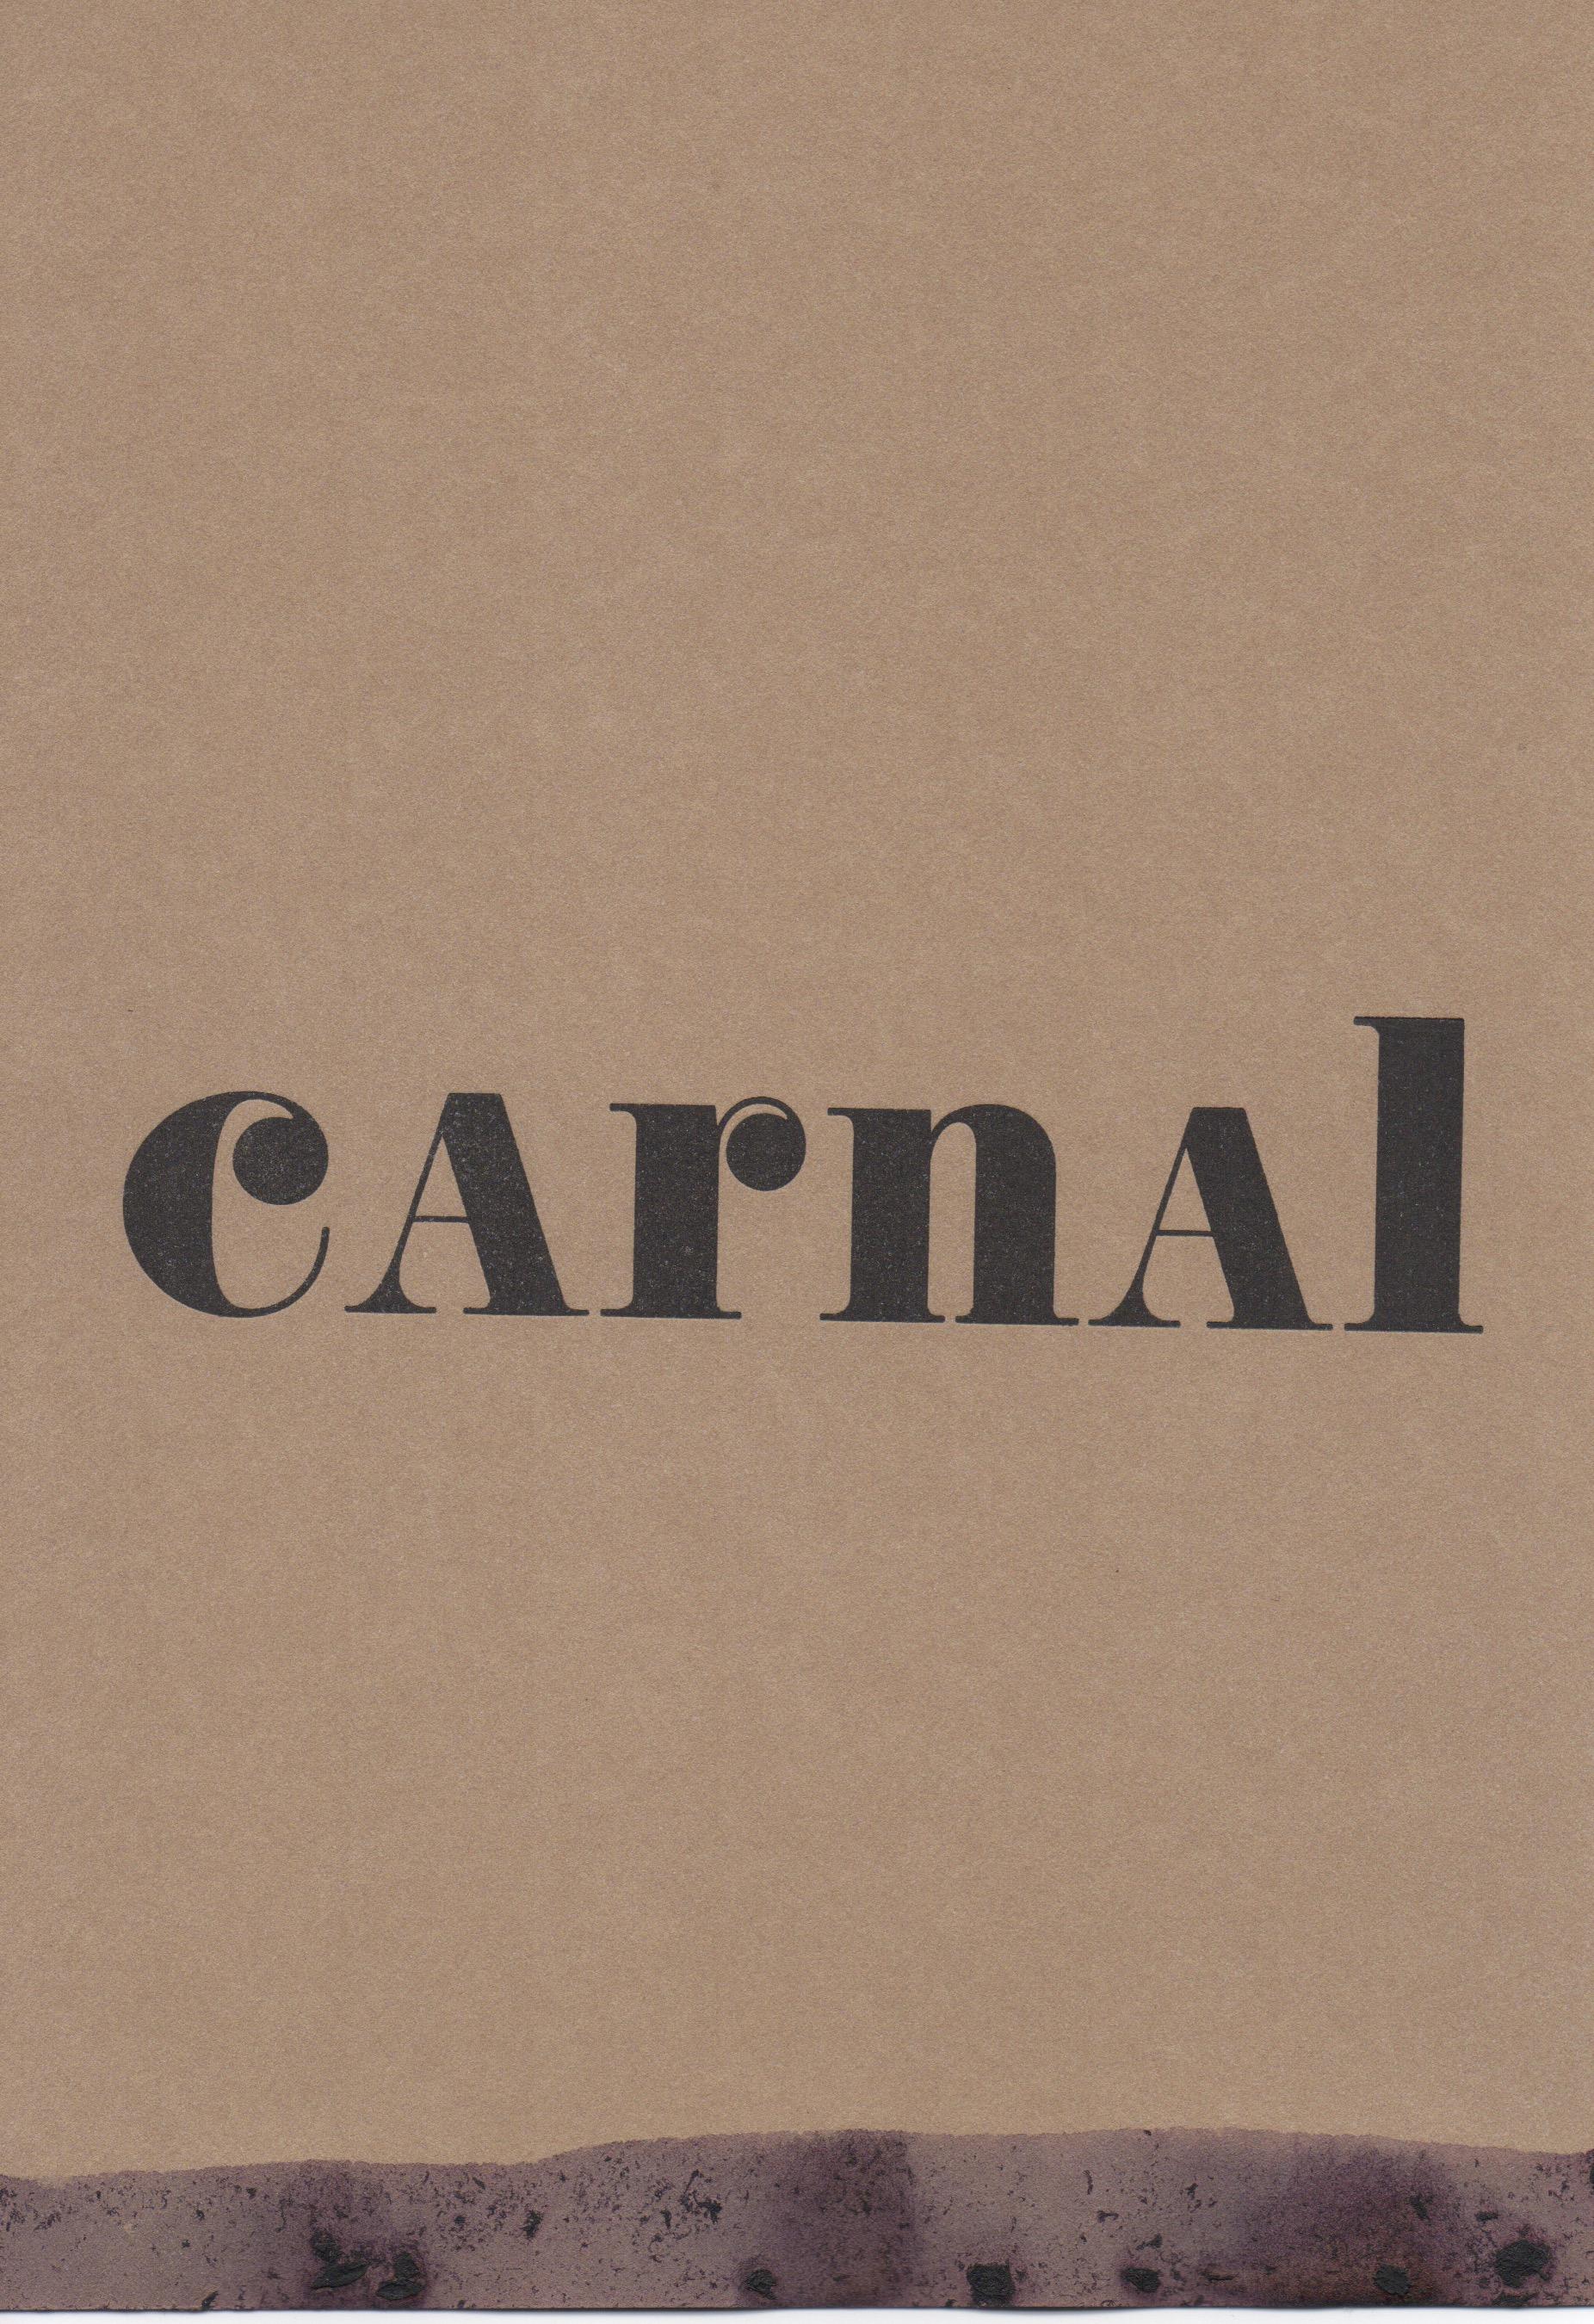 Carnal_02.jpeg